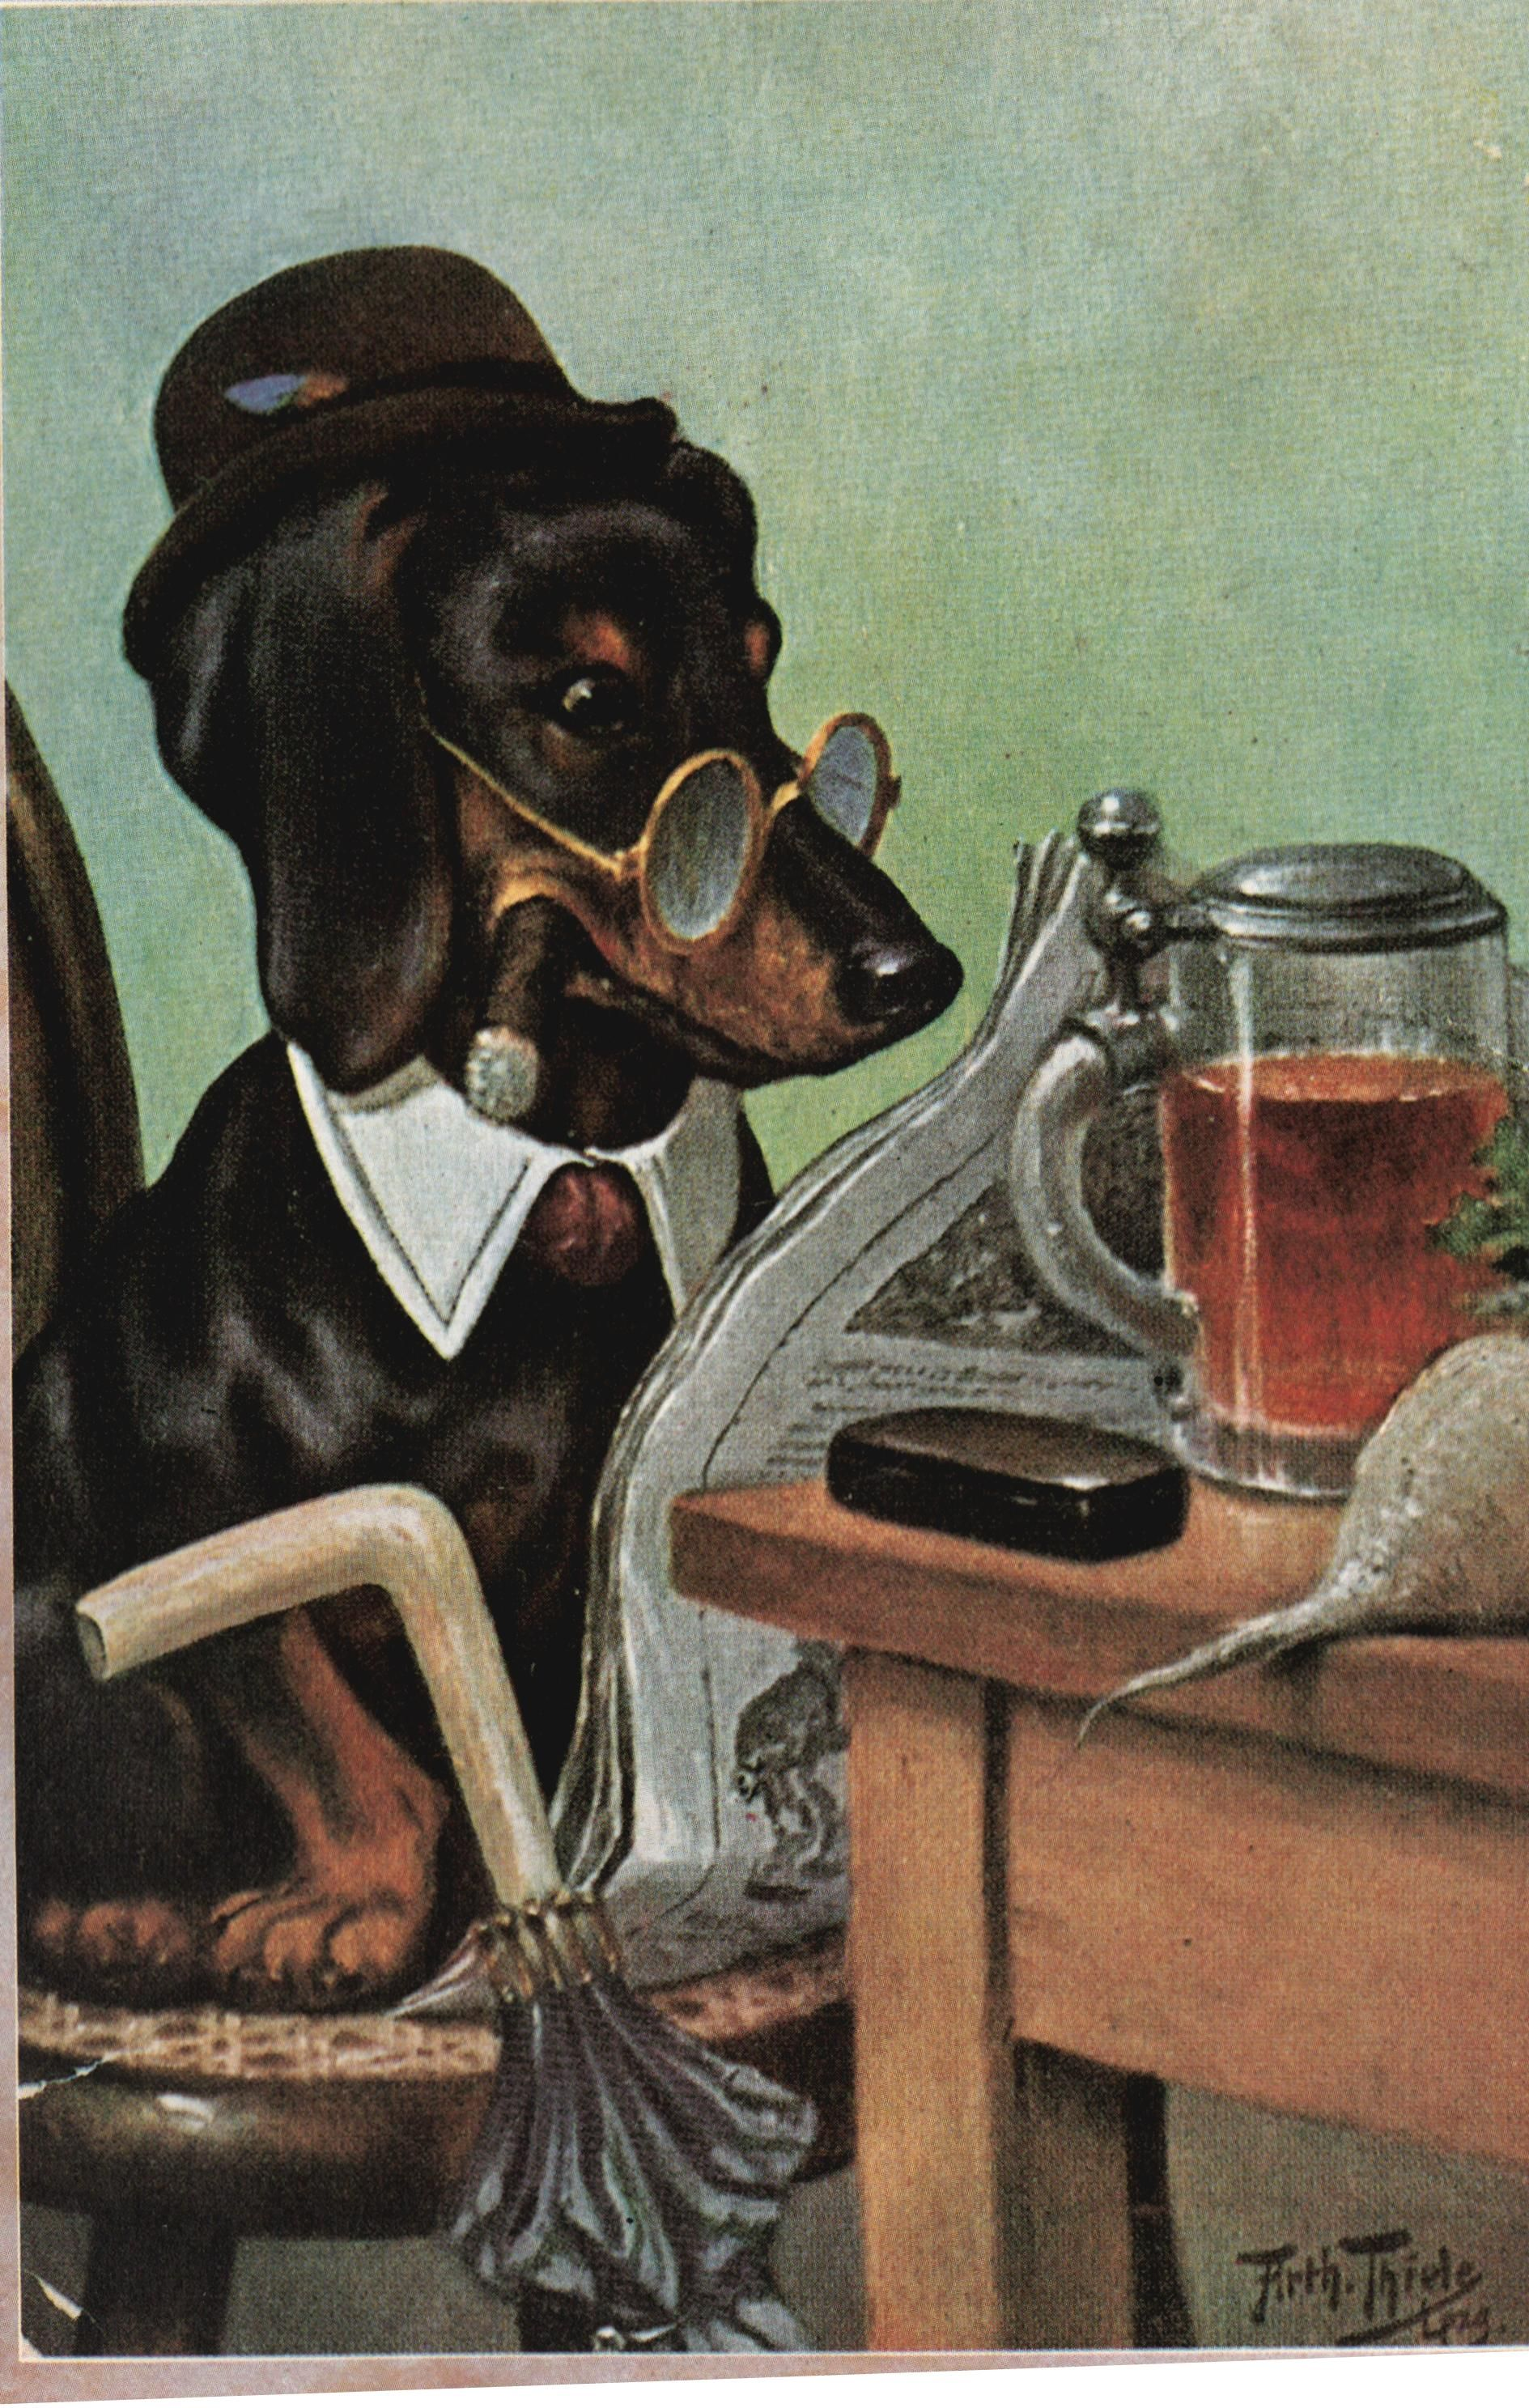 Arthur Thiele Ill Pc Dog Kneipe 43138557801 O Dogs Vintage Retro Pets Animals Pups Puppies Photo Art Canin Vintage Dachshund Dachshund Art Doxie Art